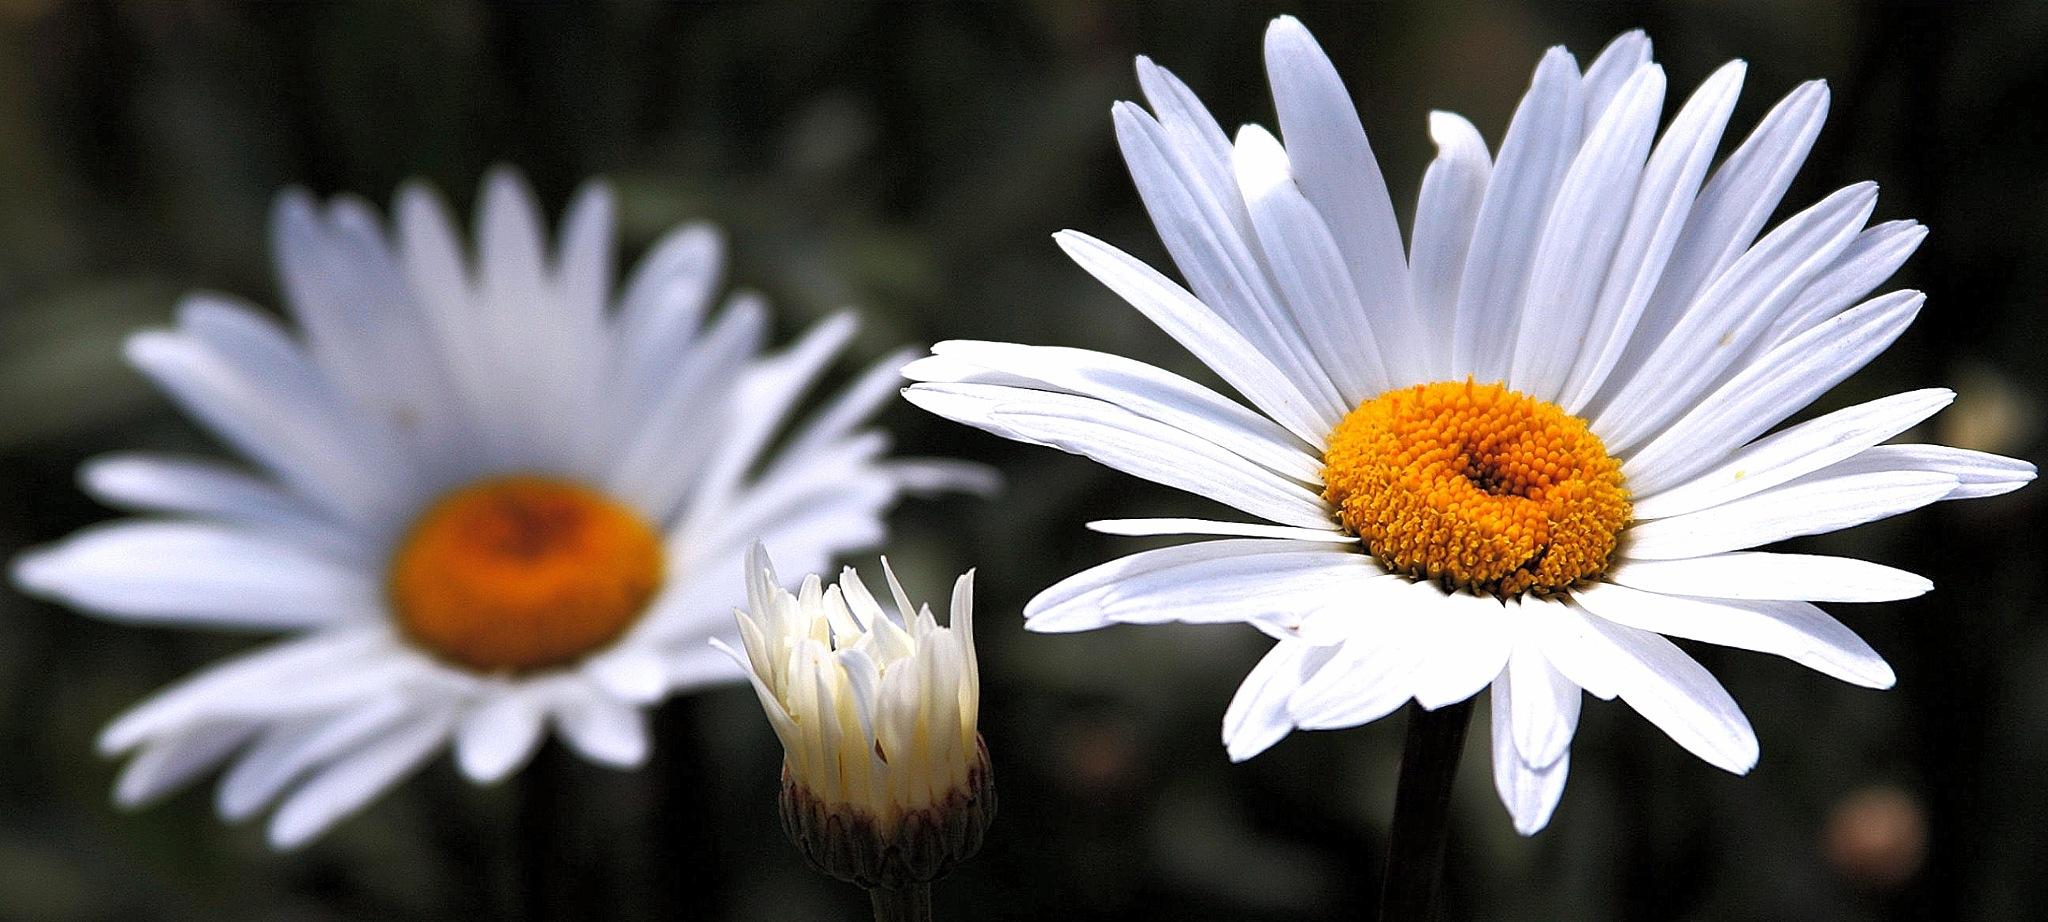 Flower...f23060556 by Michael jjg